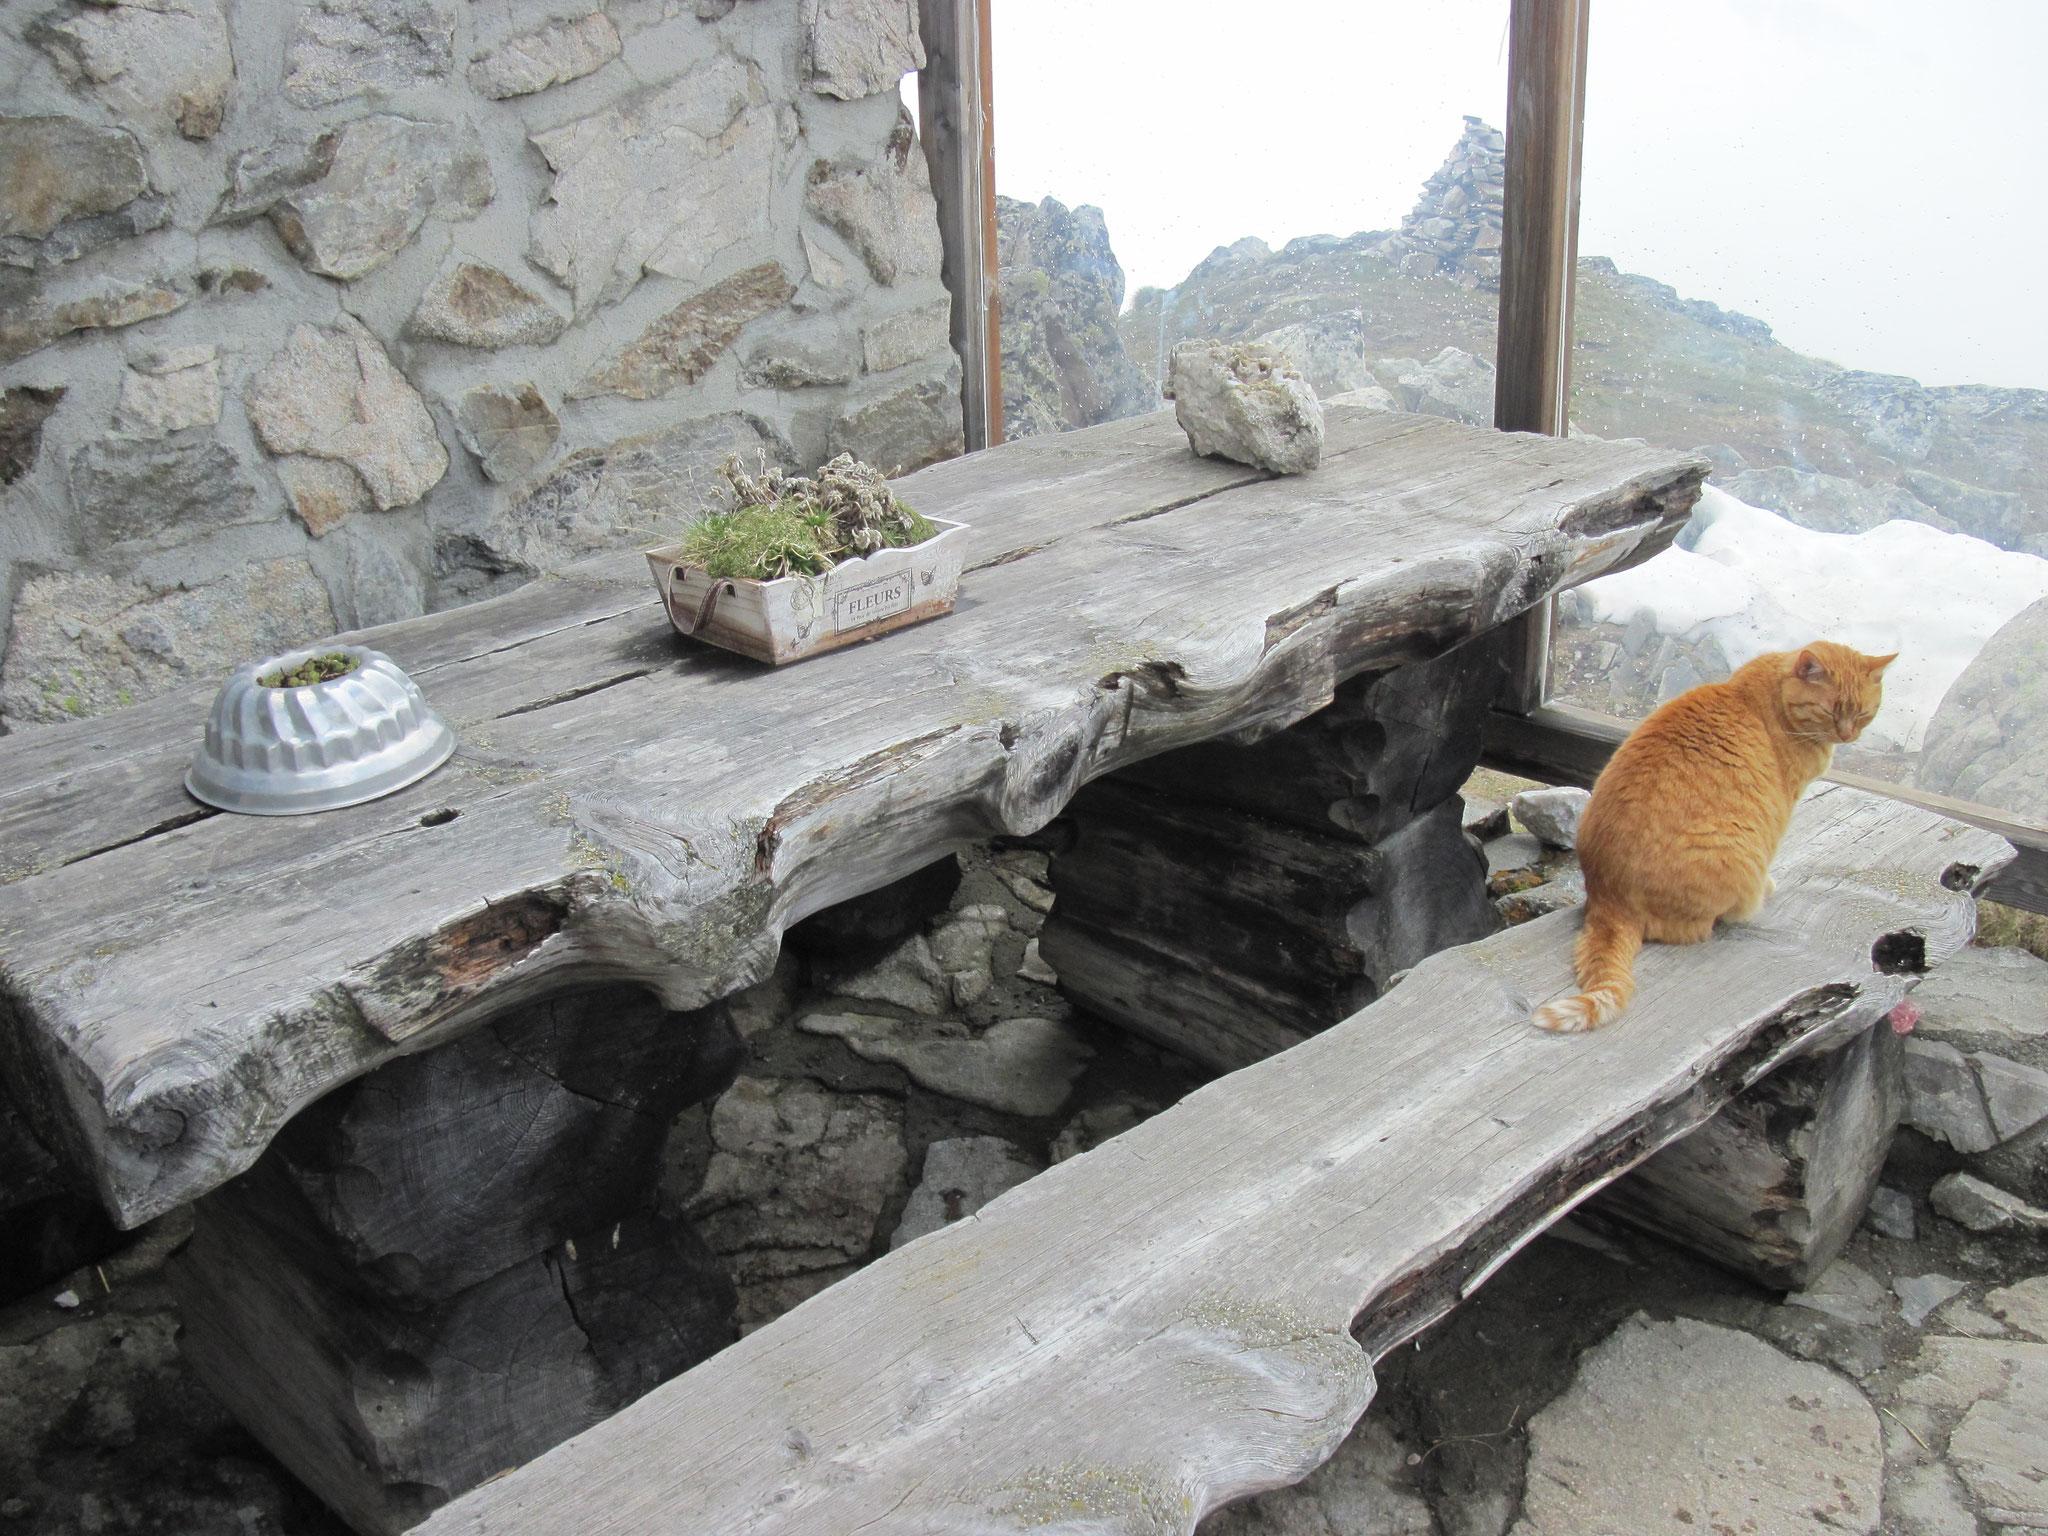 Hüttenkater geniesst das Bergleben